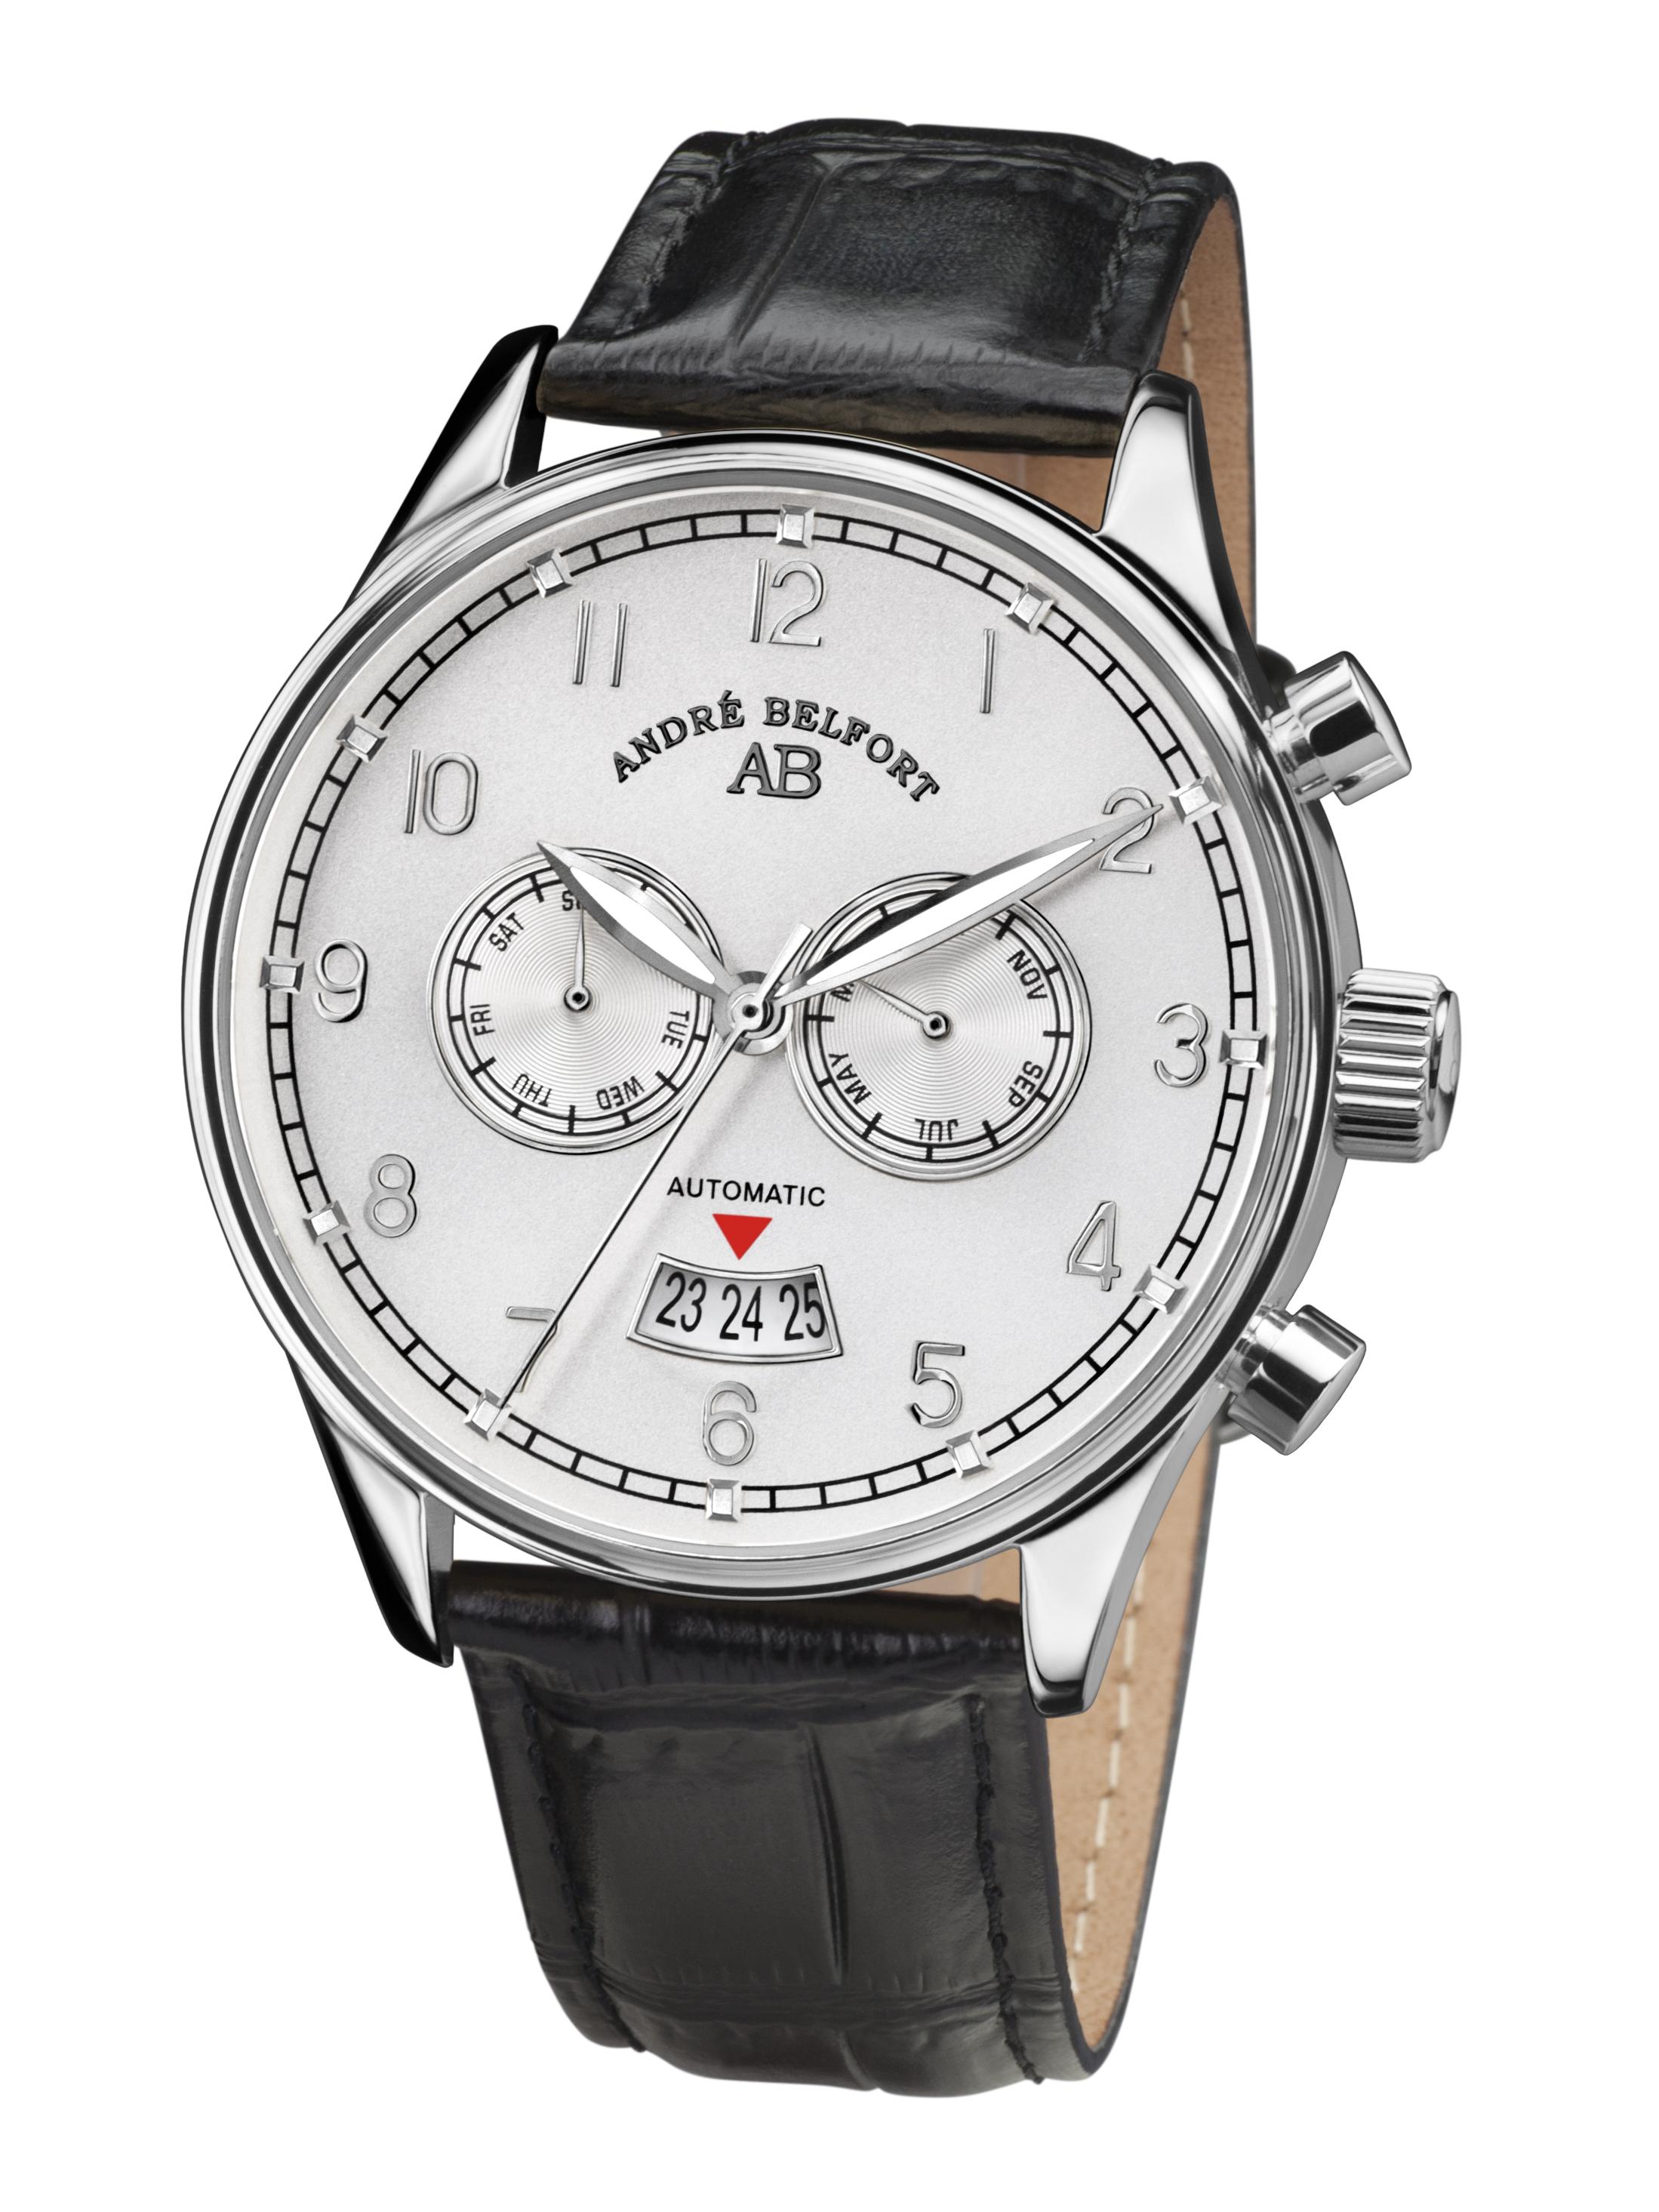 a435df228 AB_7310_stahl_silber_side 800px-Quartz_watch_ubt_EXP_123